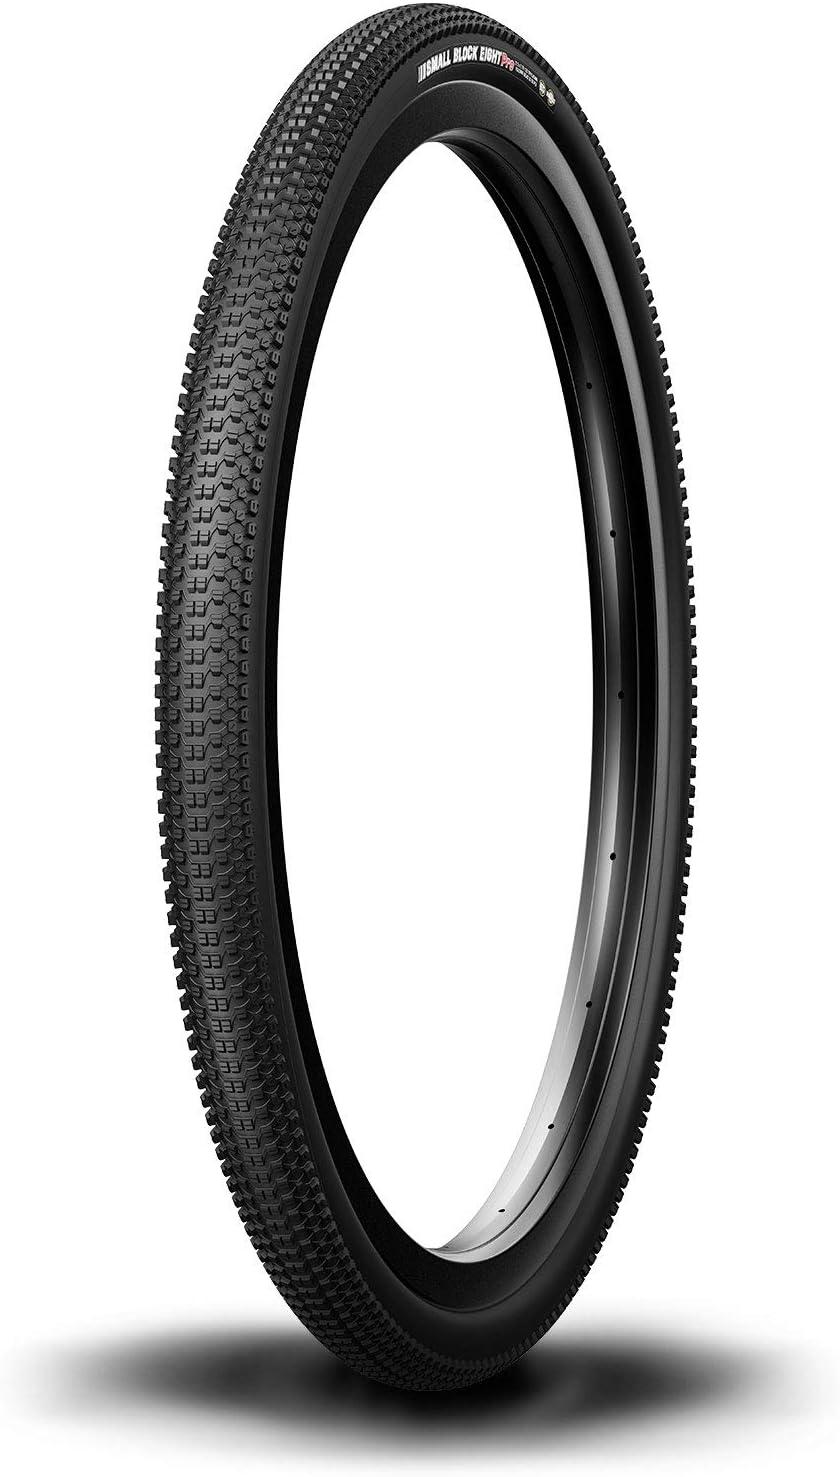 Kenda Small Block 8 Gravel Cyclocross Bicycle tire 700Cx35c DTC 120TPI Black